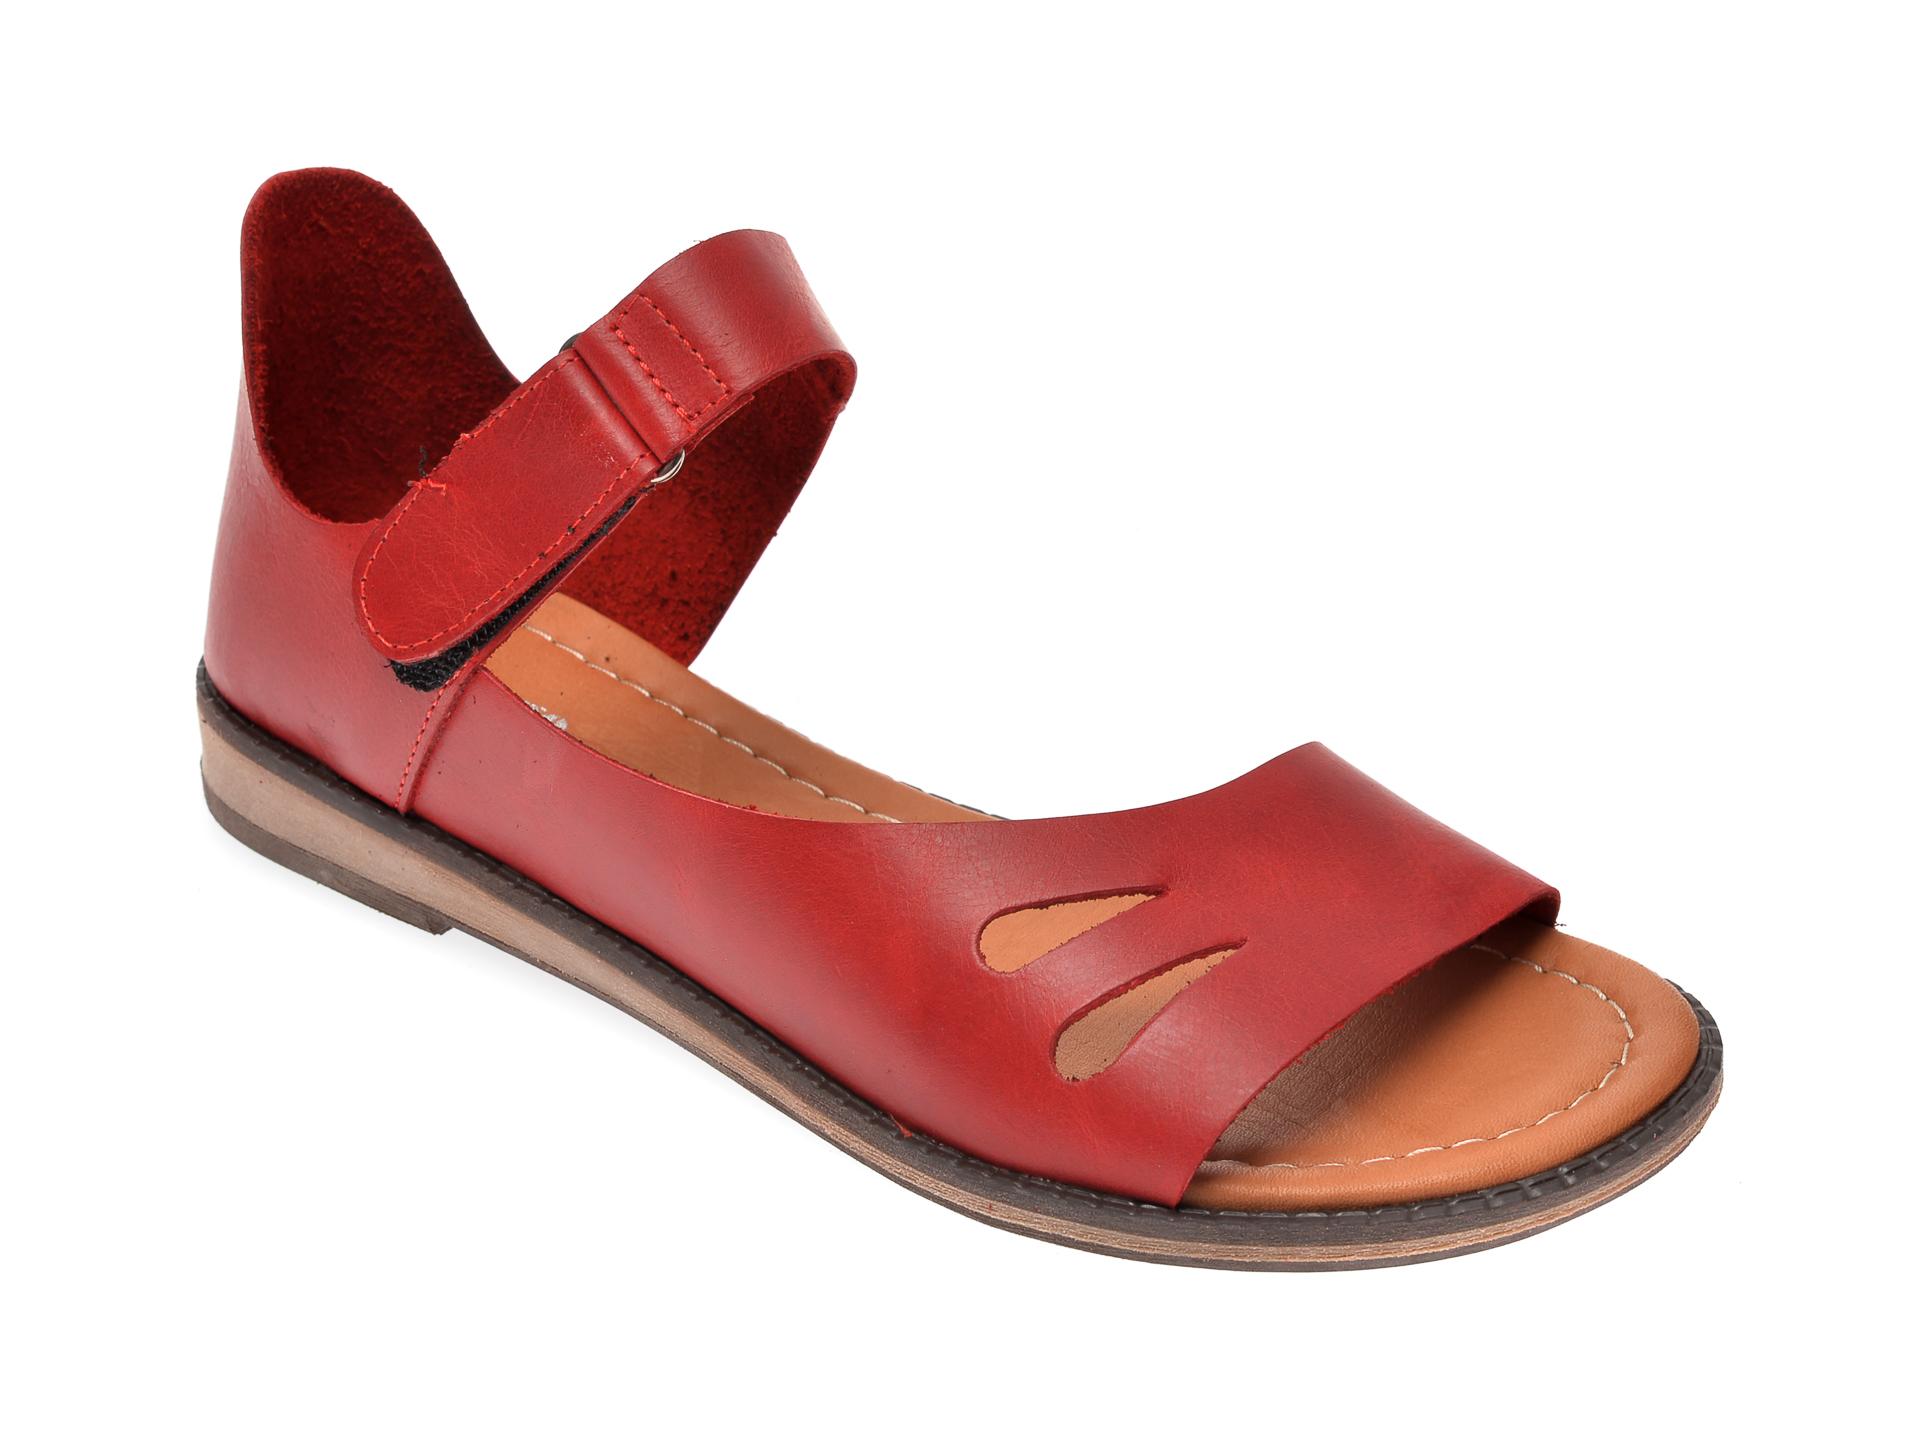 Sandale IMAGE rosii, 118, din piele naturala imagine